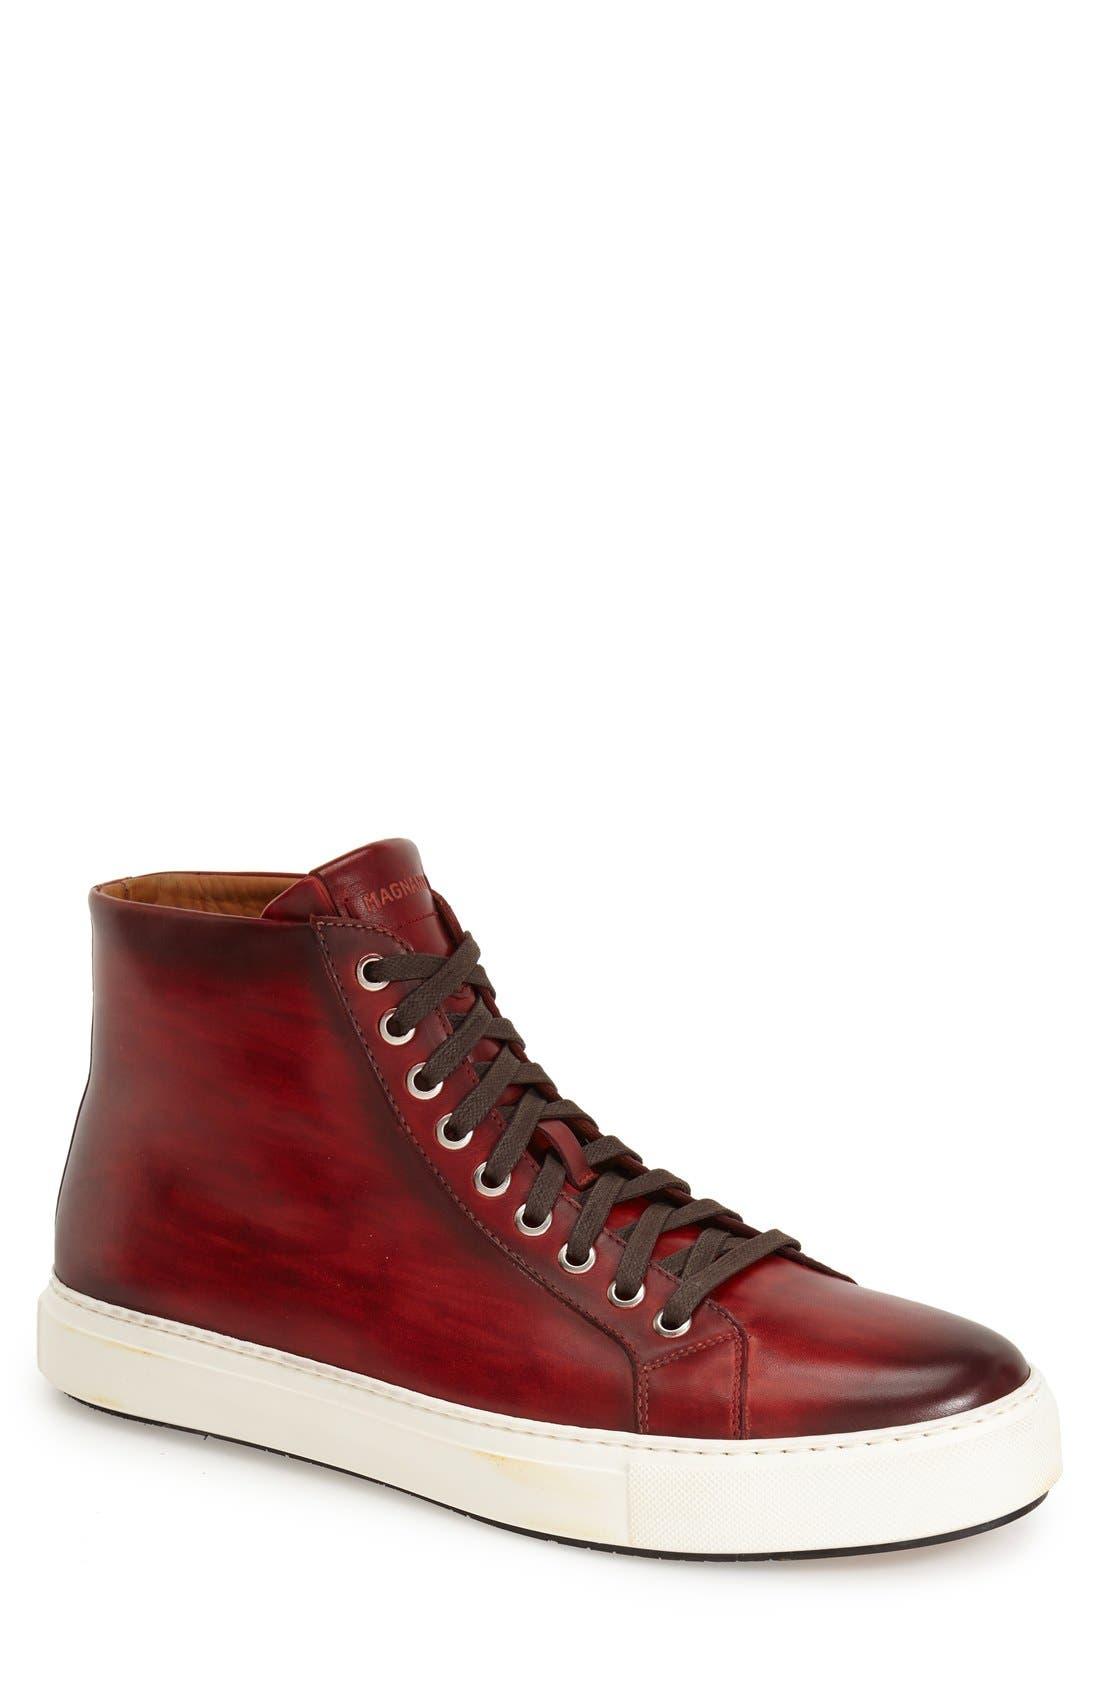 Brando High Top Sneaker,                             Main thumbnail 1, color,                             RED